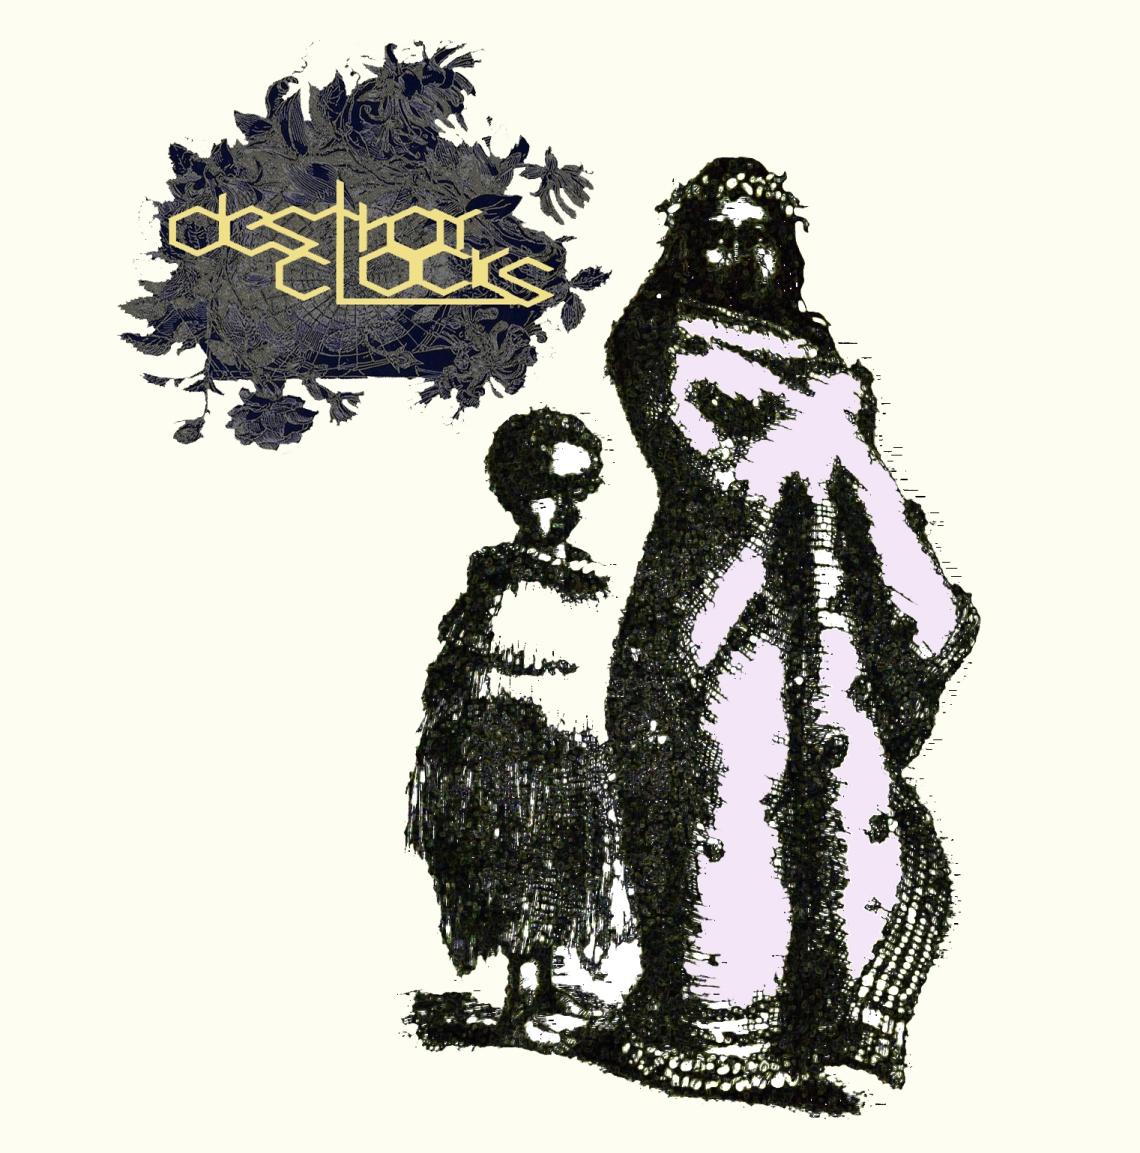 DestroyClocks art 4